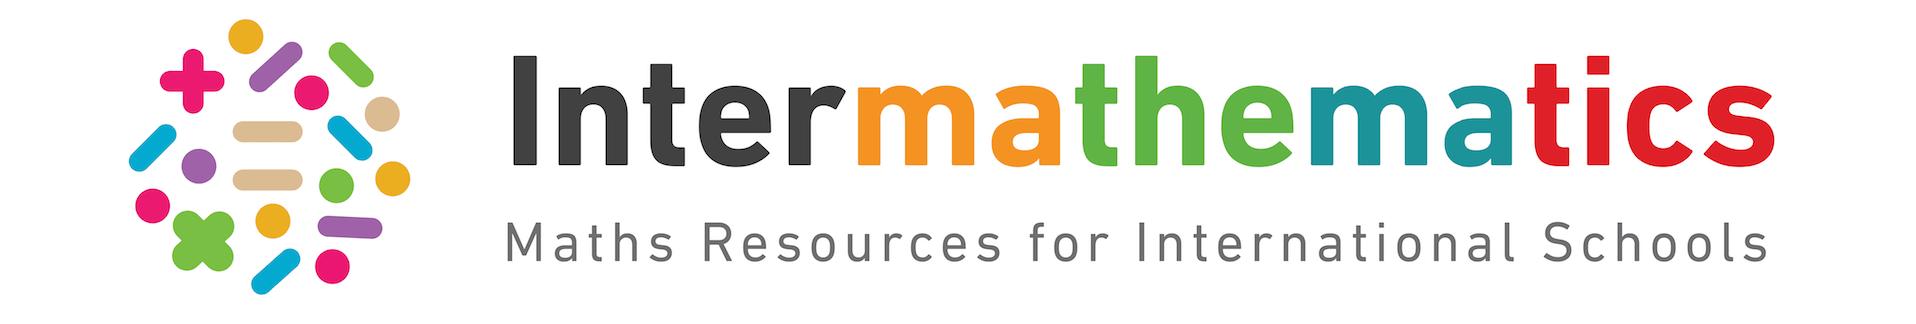 intermathematics